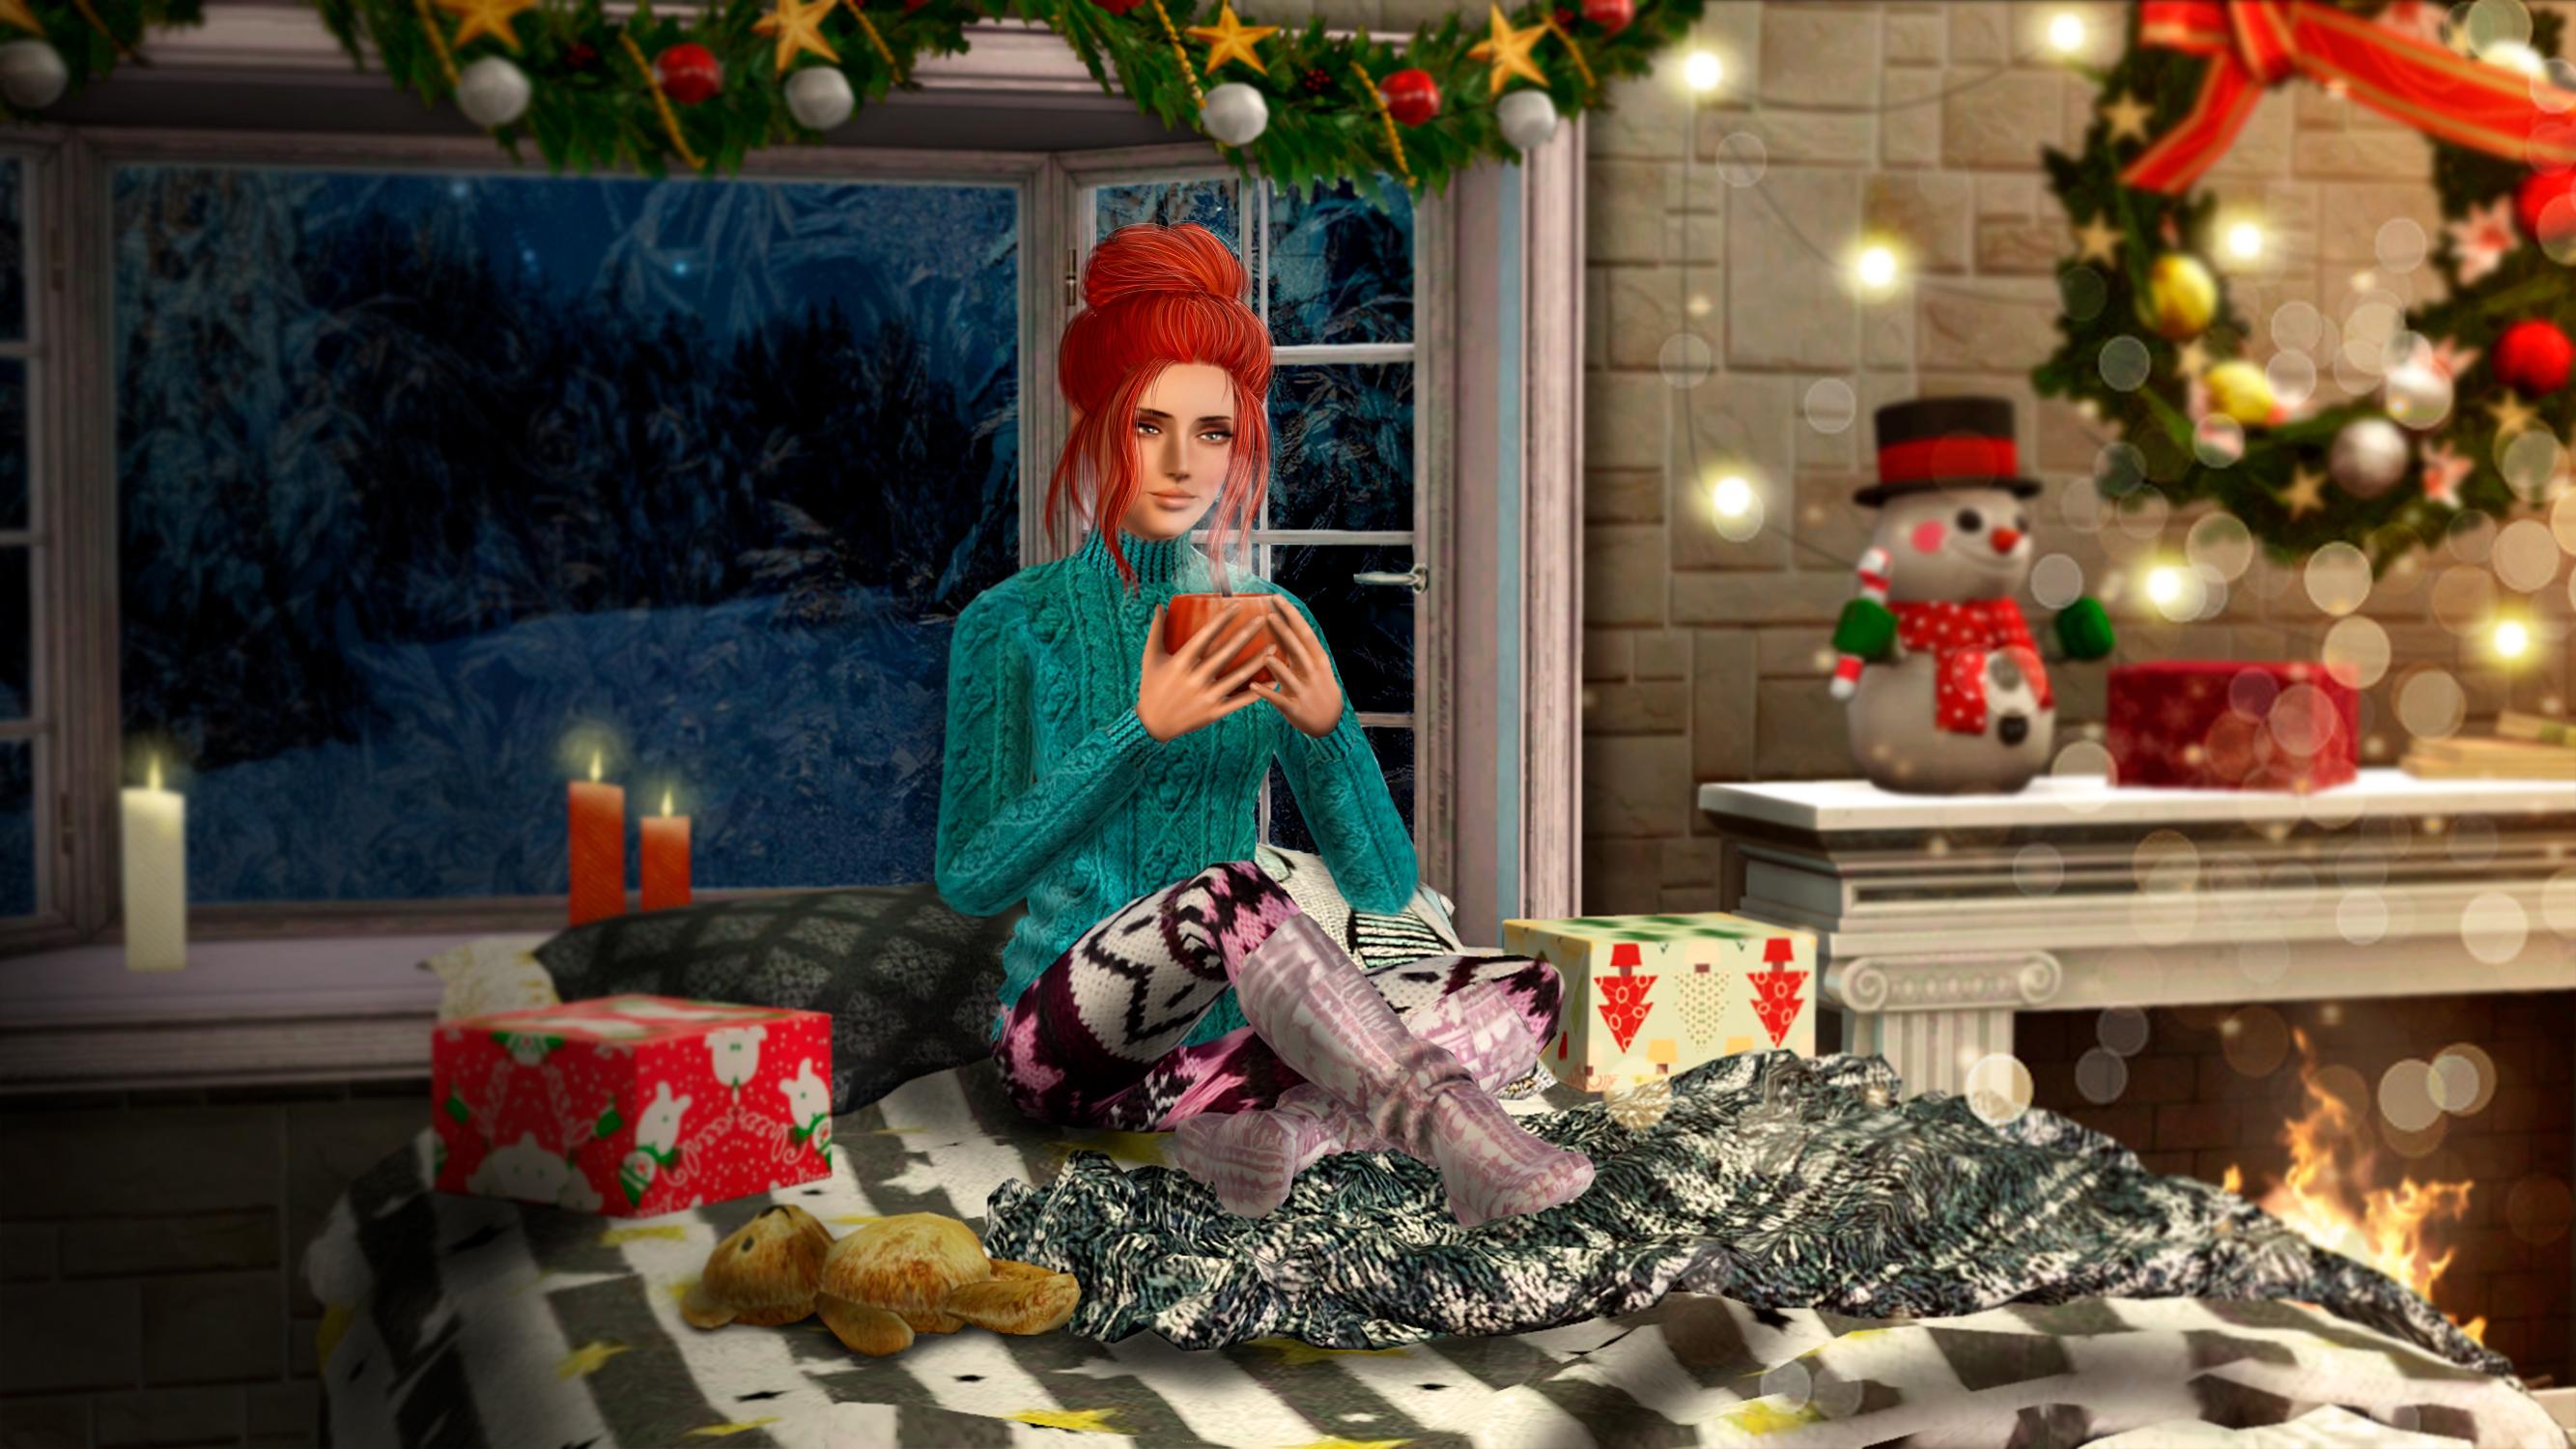 Winter-Fairytale.jpg